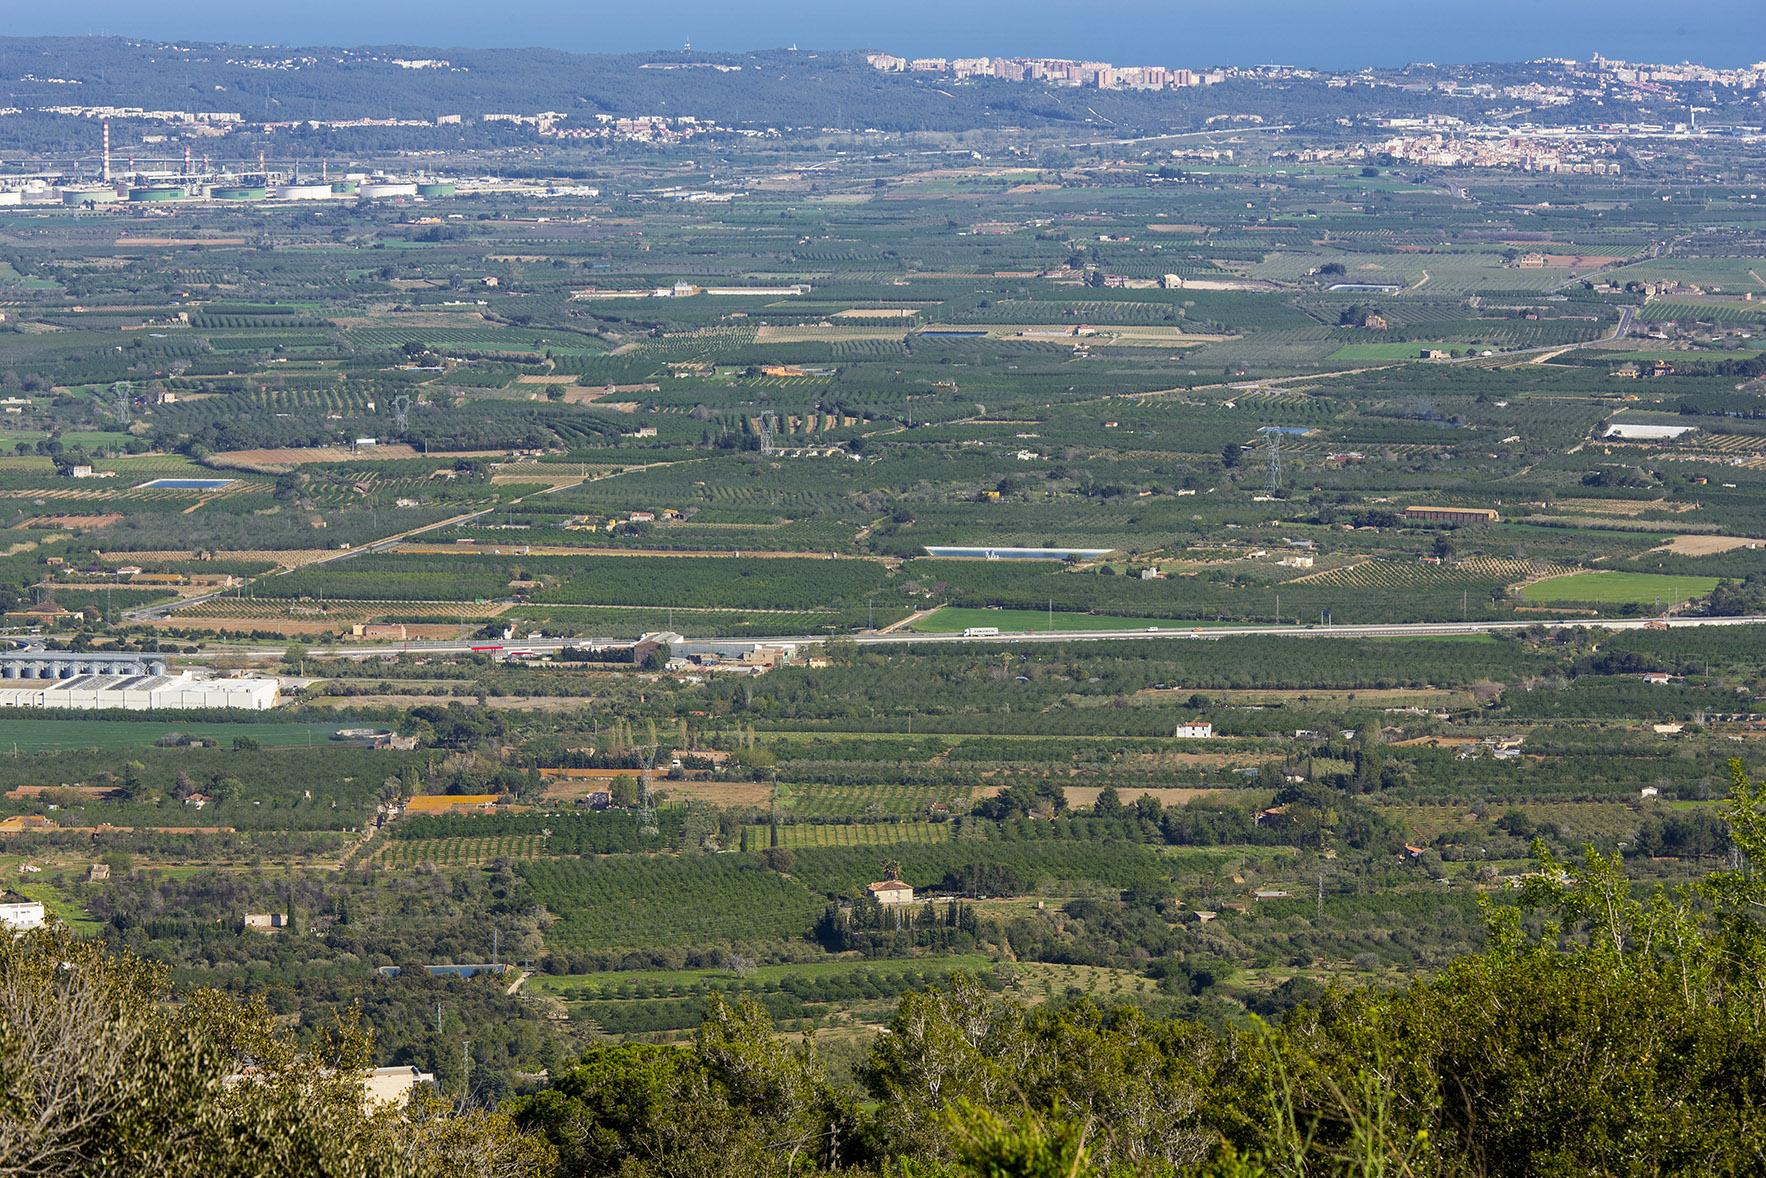 <p><strong>Unitat de Paisatge: </strong>Camps del Francolí</p> <p><strong>Mirador: </strong>Sant Pere del Puig</p> <p><strong>Autor:</strong> Jordi Salinas</p> <p><strong>Crèdit:</strong> Arxiu d'imatges de l'Observatori del Paisatge de Catalunya (Jordi Salinas)</p> <p><strong>Reproducció:</strong> CC BY-NC-SA</p>  <a href='http://arxiu.catpaisatge.net/wp-content/uploads/2018/08/25.jpg'' class='download-button' download>Descarrega</a> <a href='http://arxiu.catpaisatge.net/cercador/?details.vm?q=id:0000005808' target='blank' class='fitxa-button' >Fitxa</a>